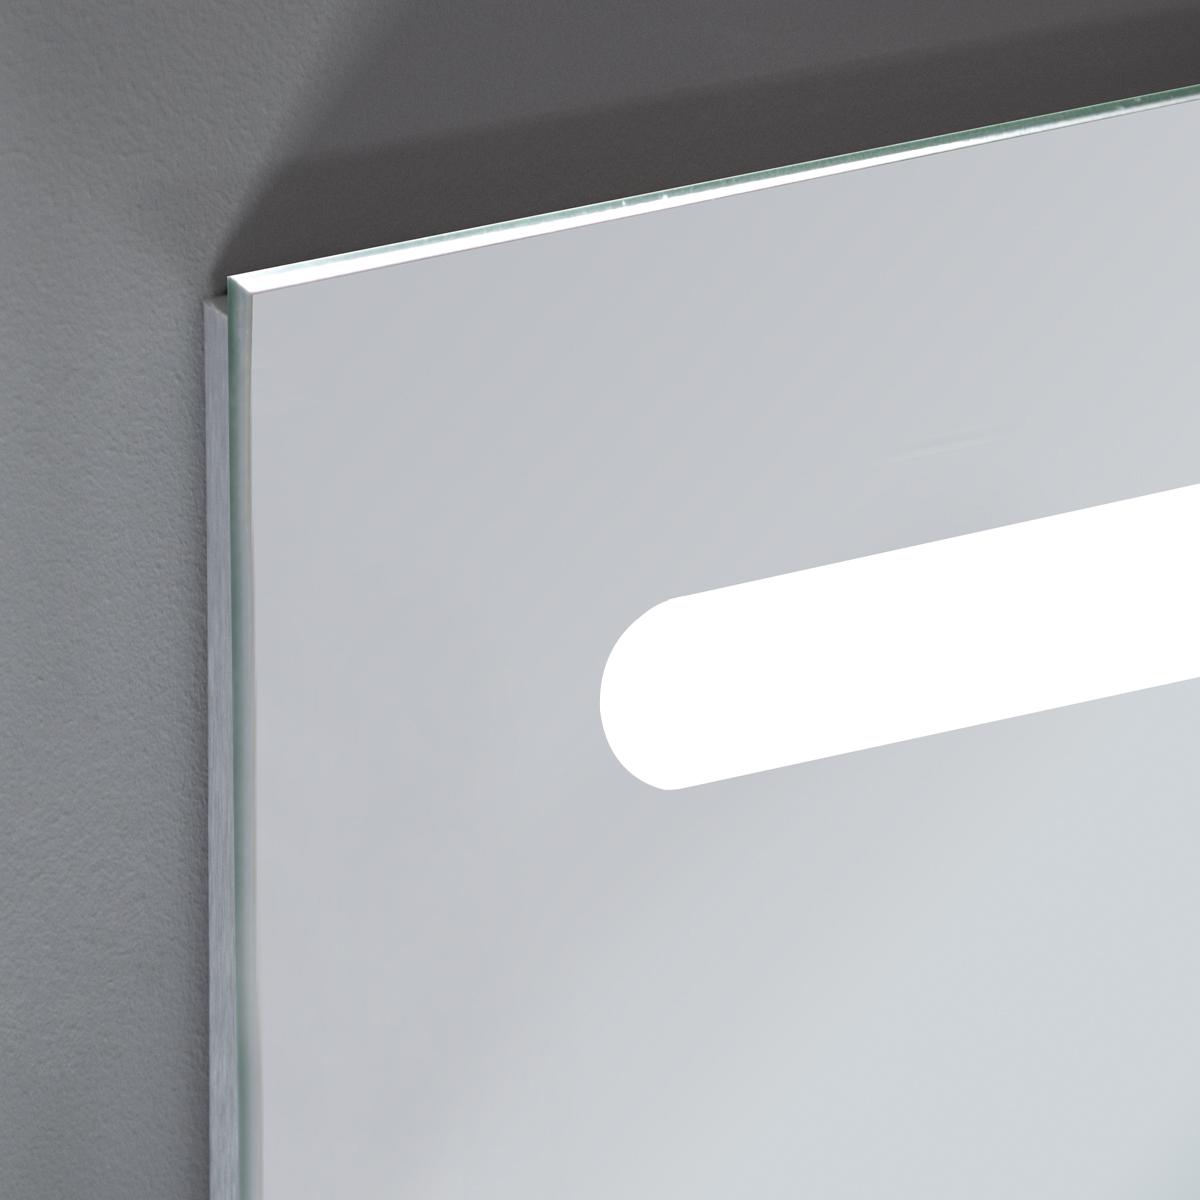 nairobi basha det 1 Espejo luz LED